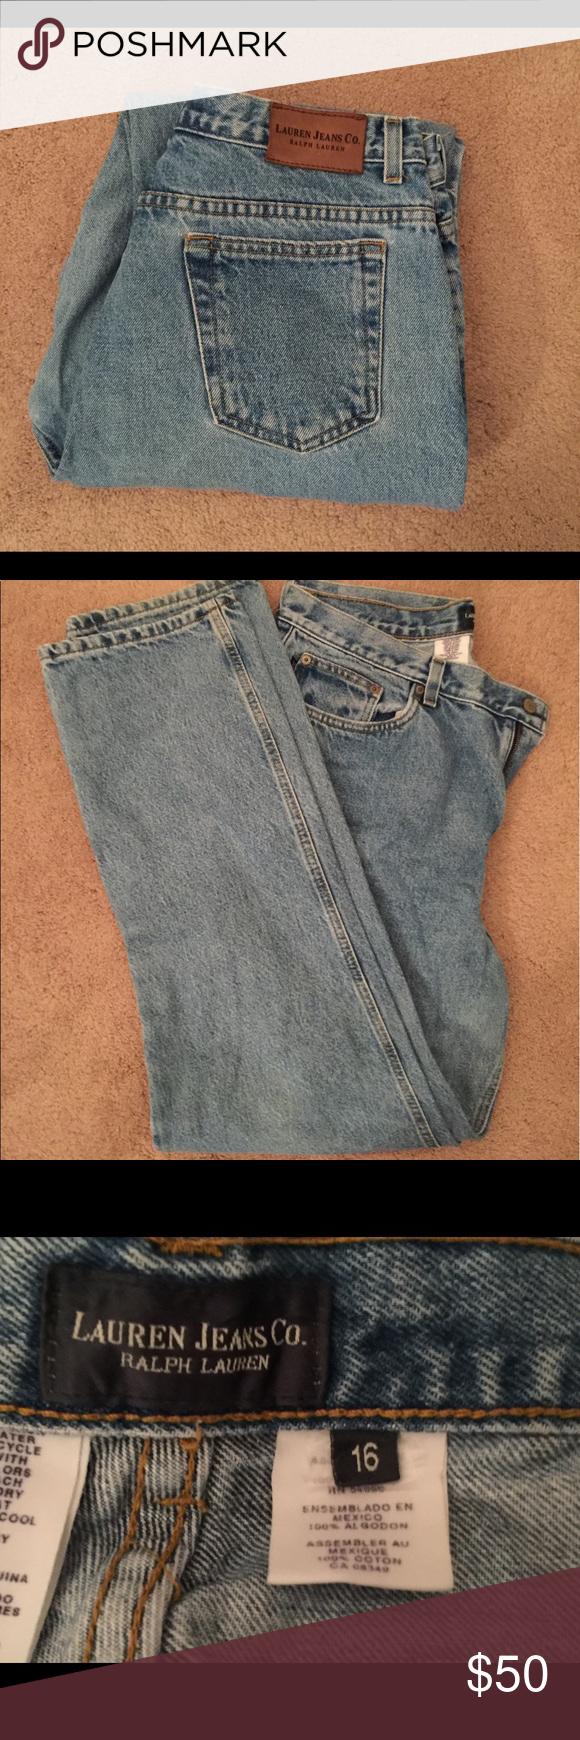 💐Ralph Lauren jeans/Lauren jeans co💐 Ralph Lauren/Lauren Jeans co jeans excellent condition Lauren Ralph Lauren Jeans Straight Leg